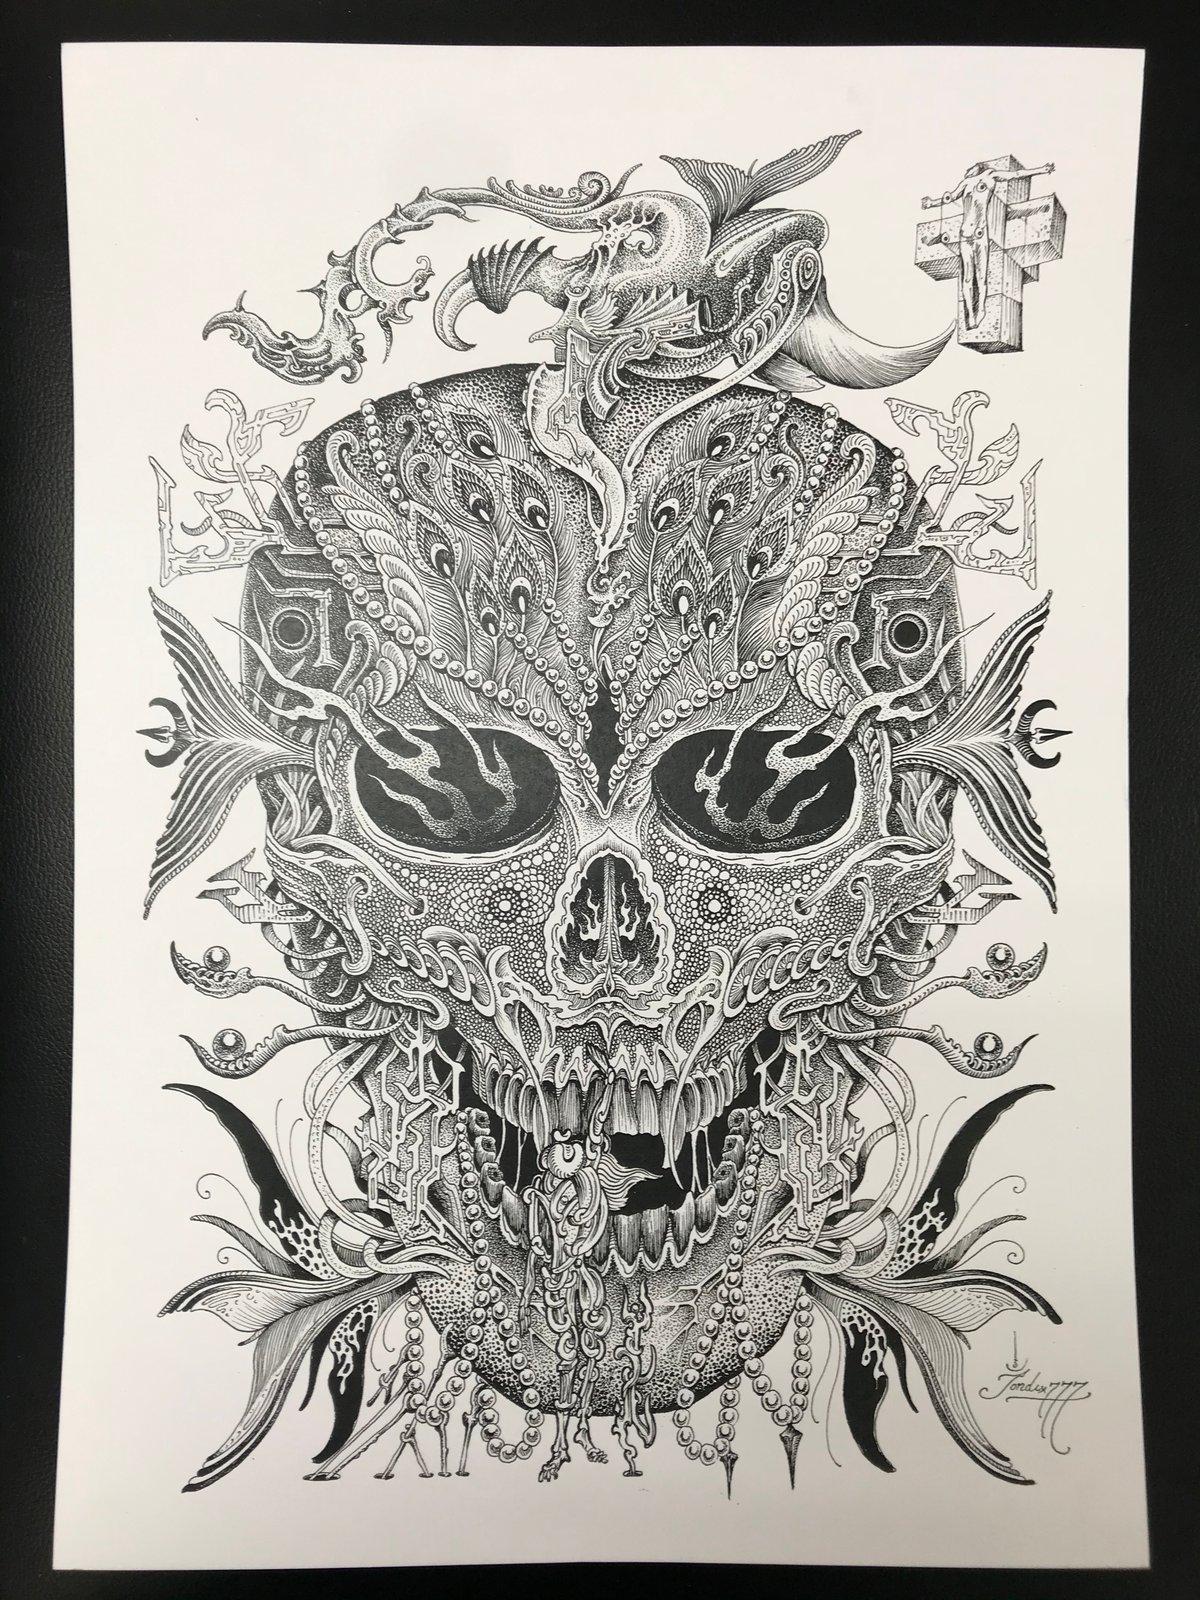 Image of Jondix Skull print